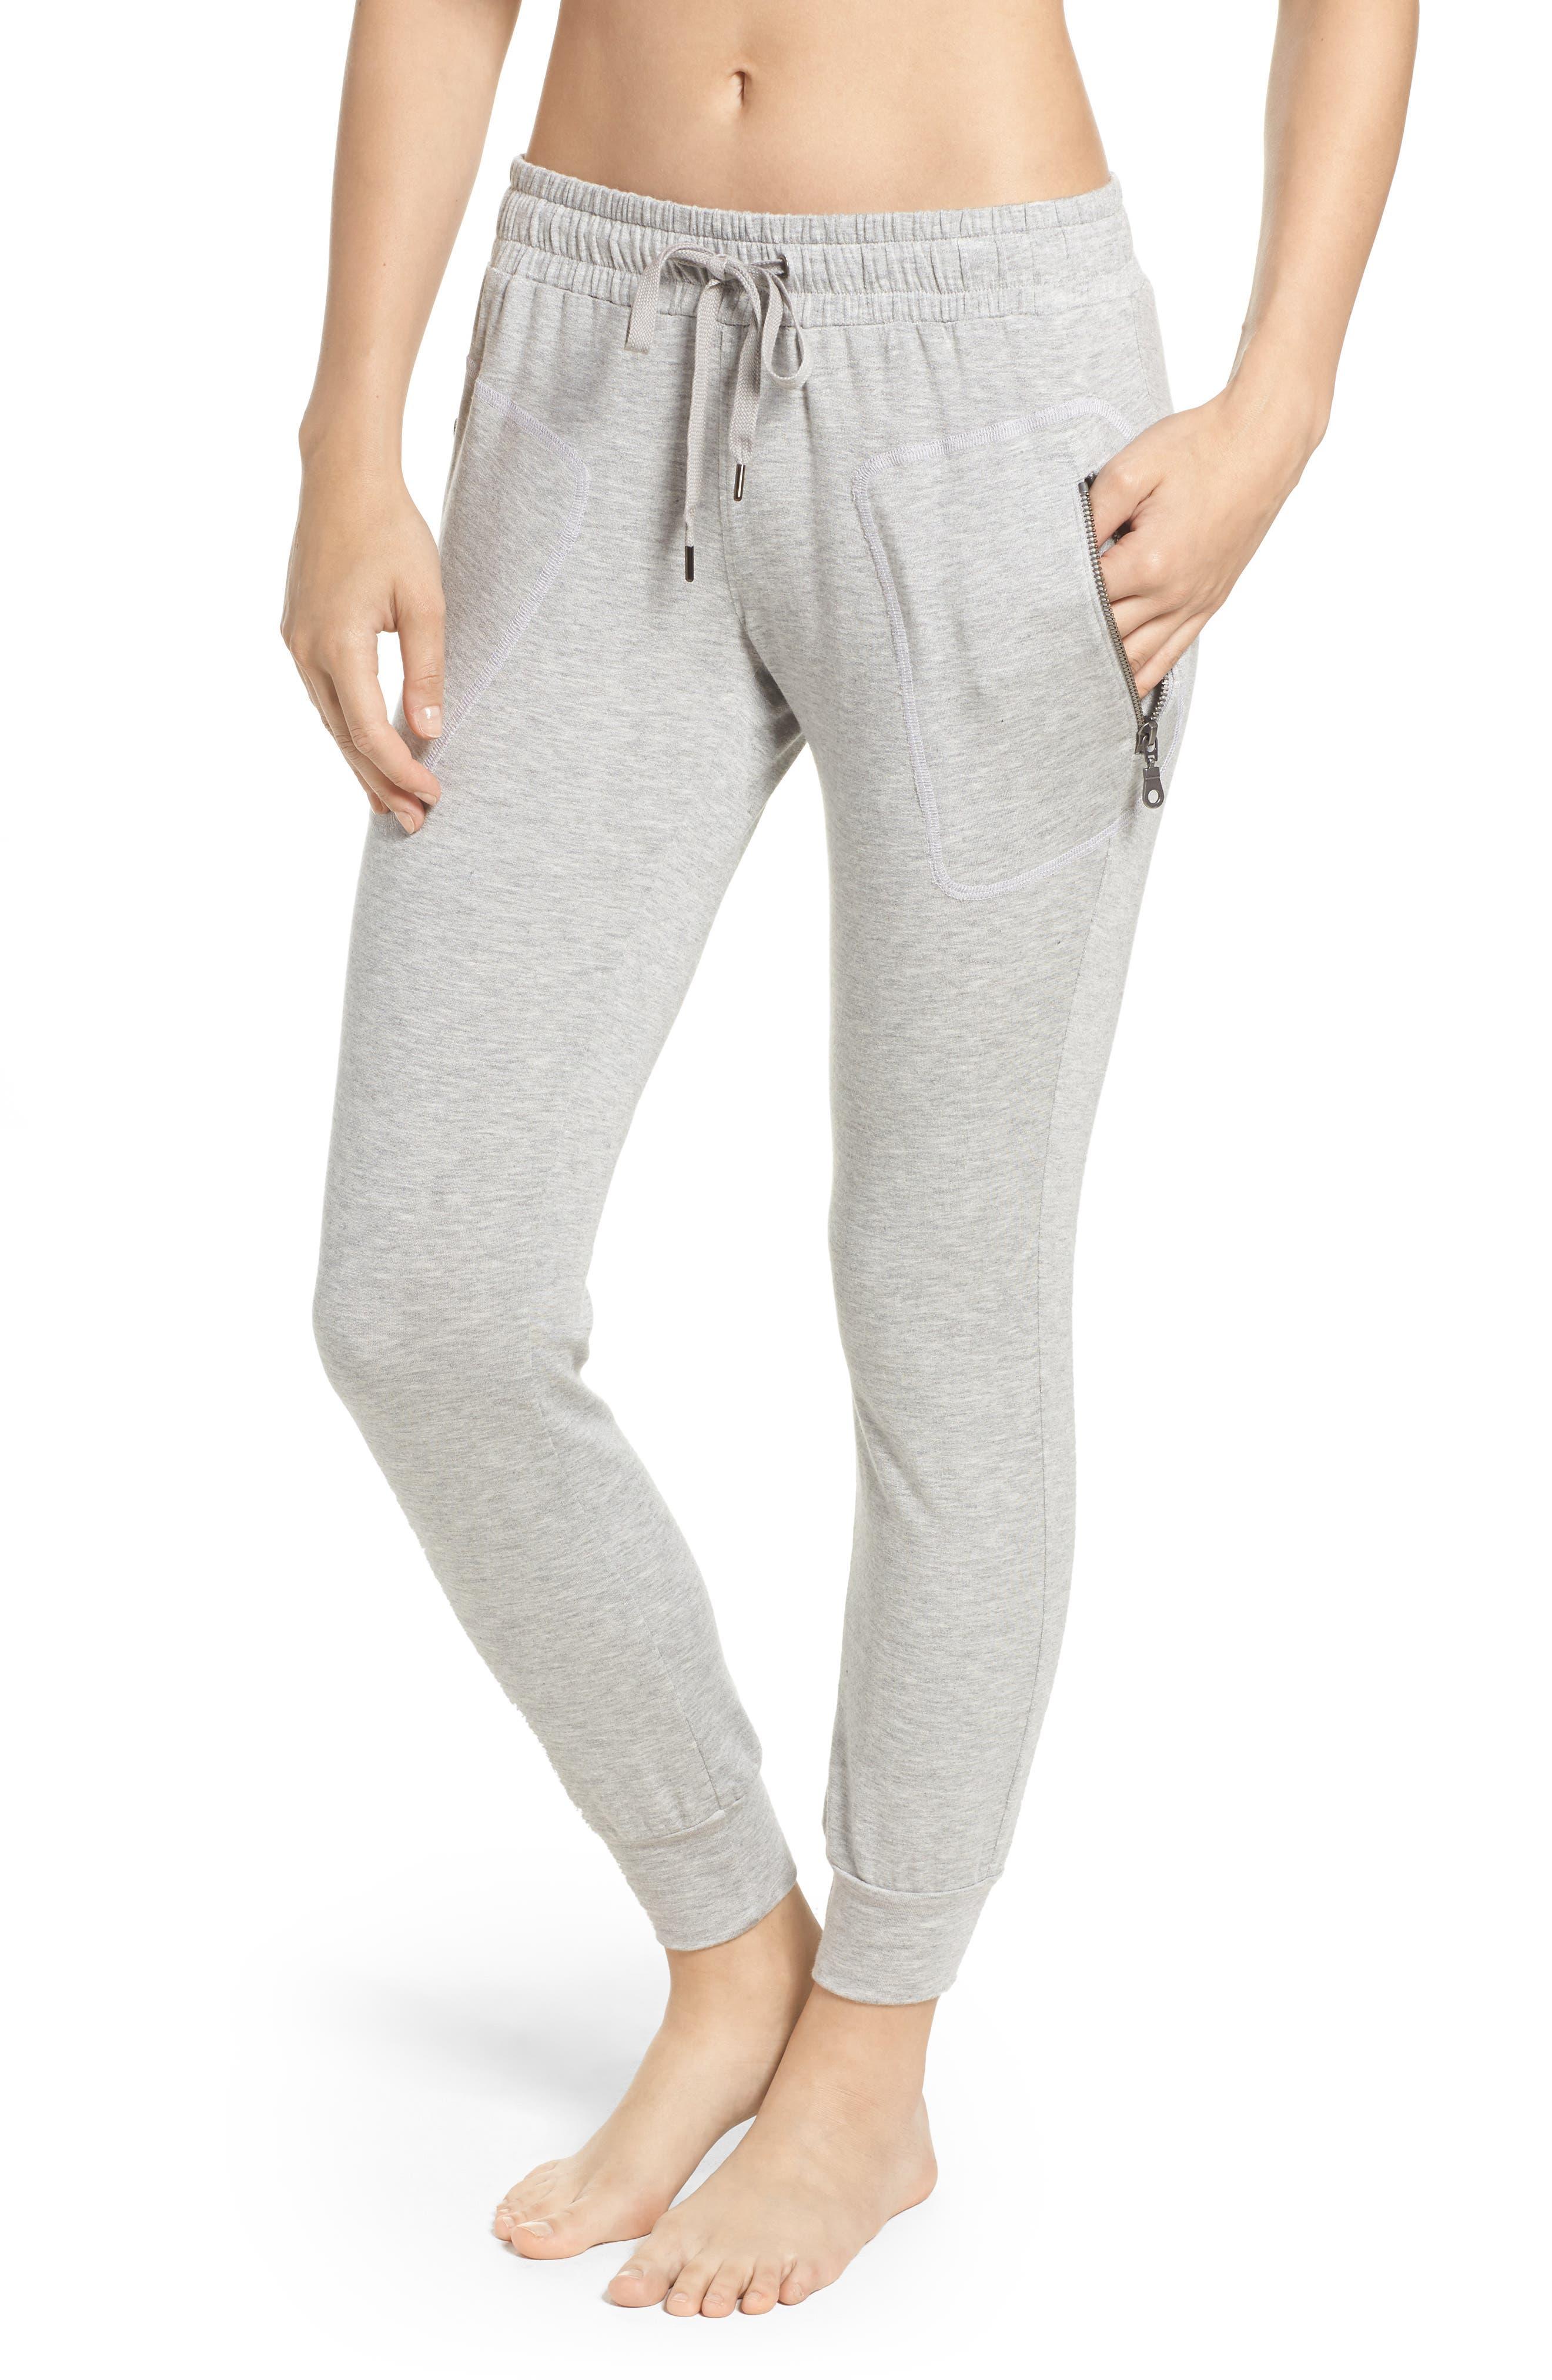 DAVID LERNER The New Penn Sweatpants in Grey